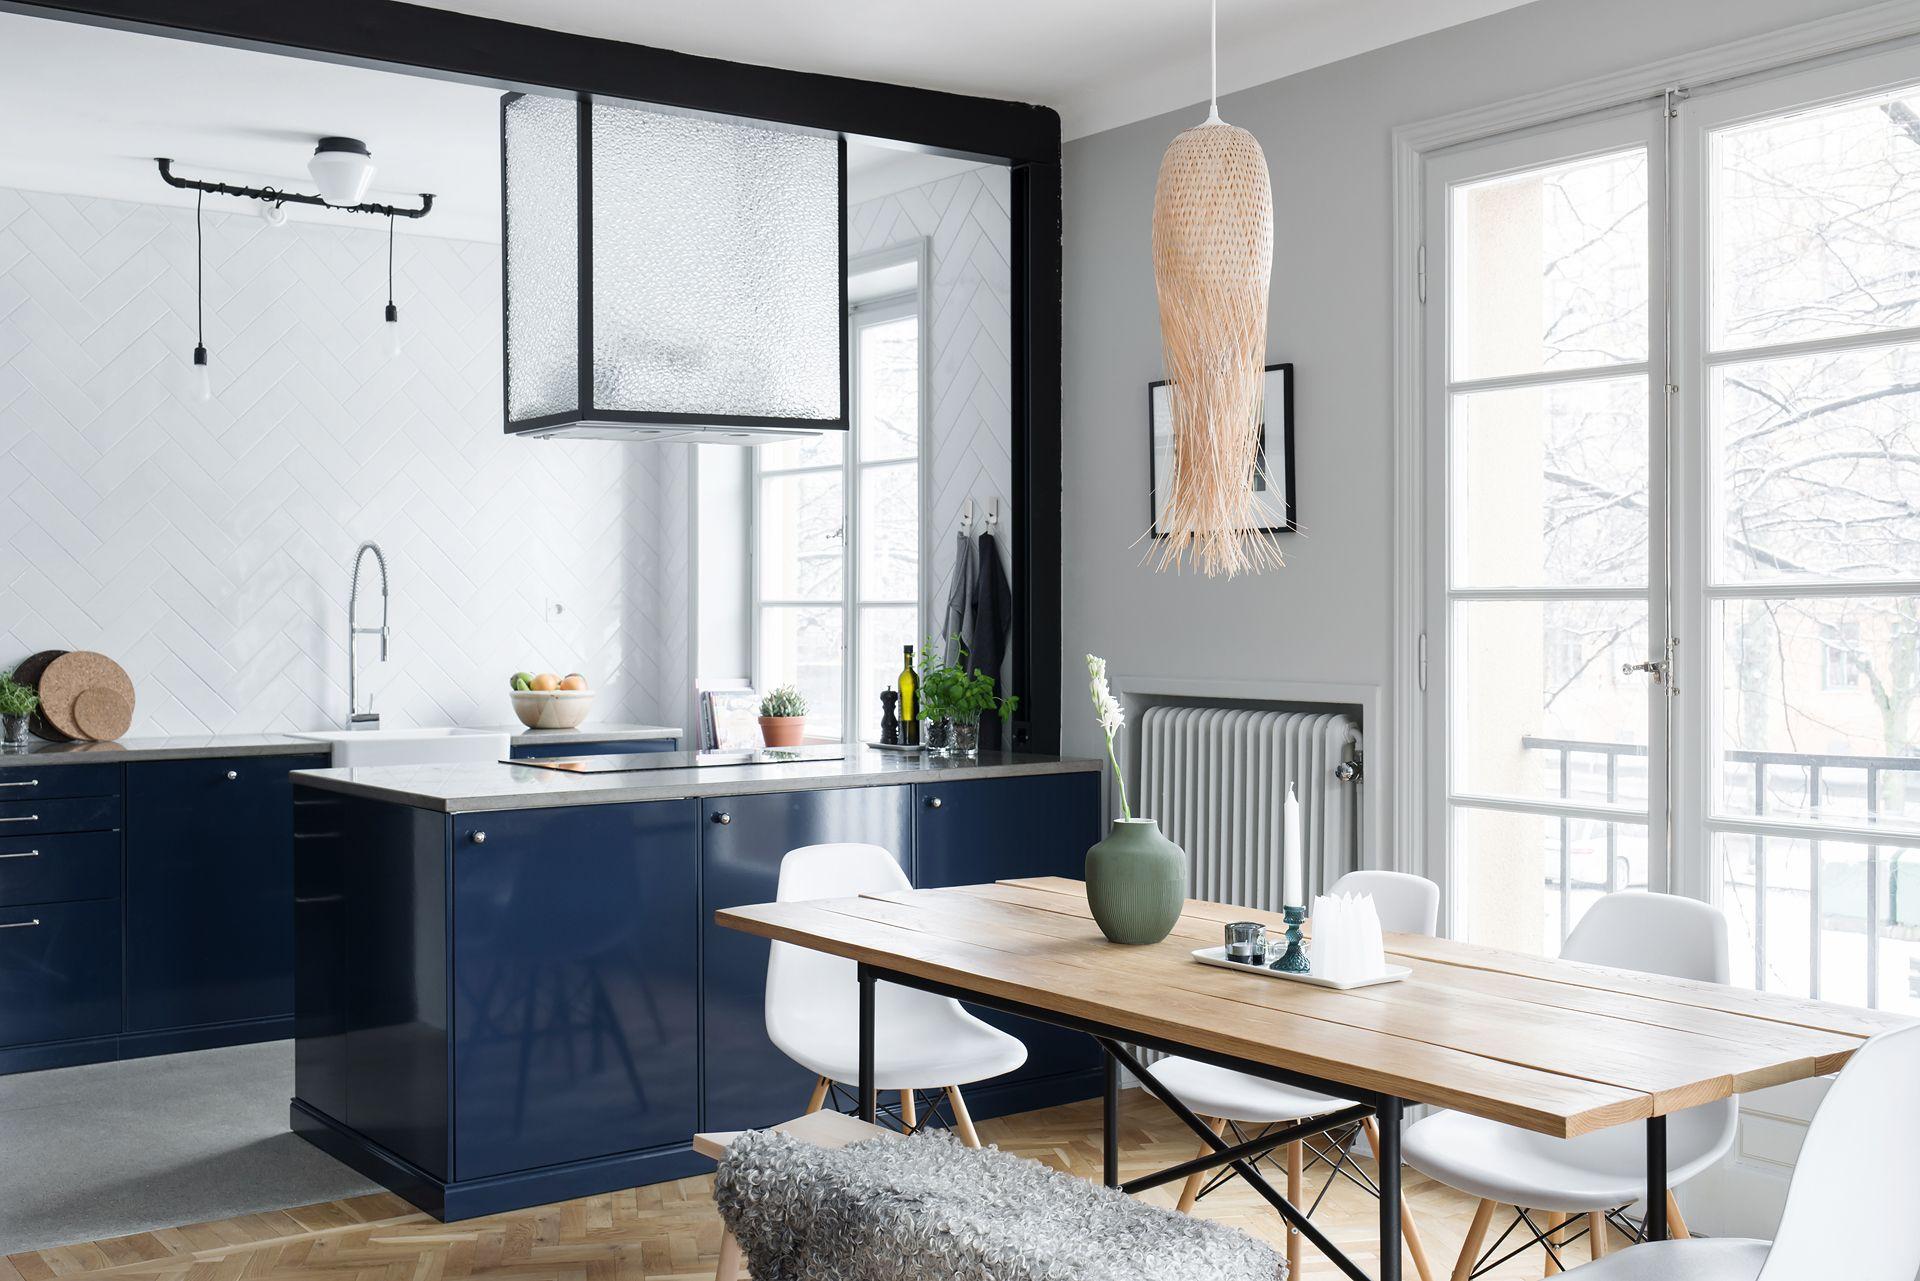 Ideas for kitchen decor  Pink Girl Sculpture for Unique Gifts and Unique Home Decor  Blue